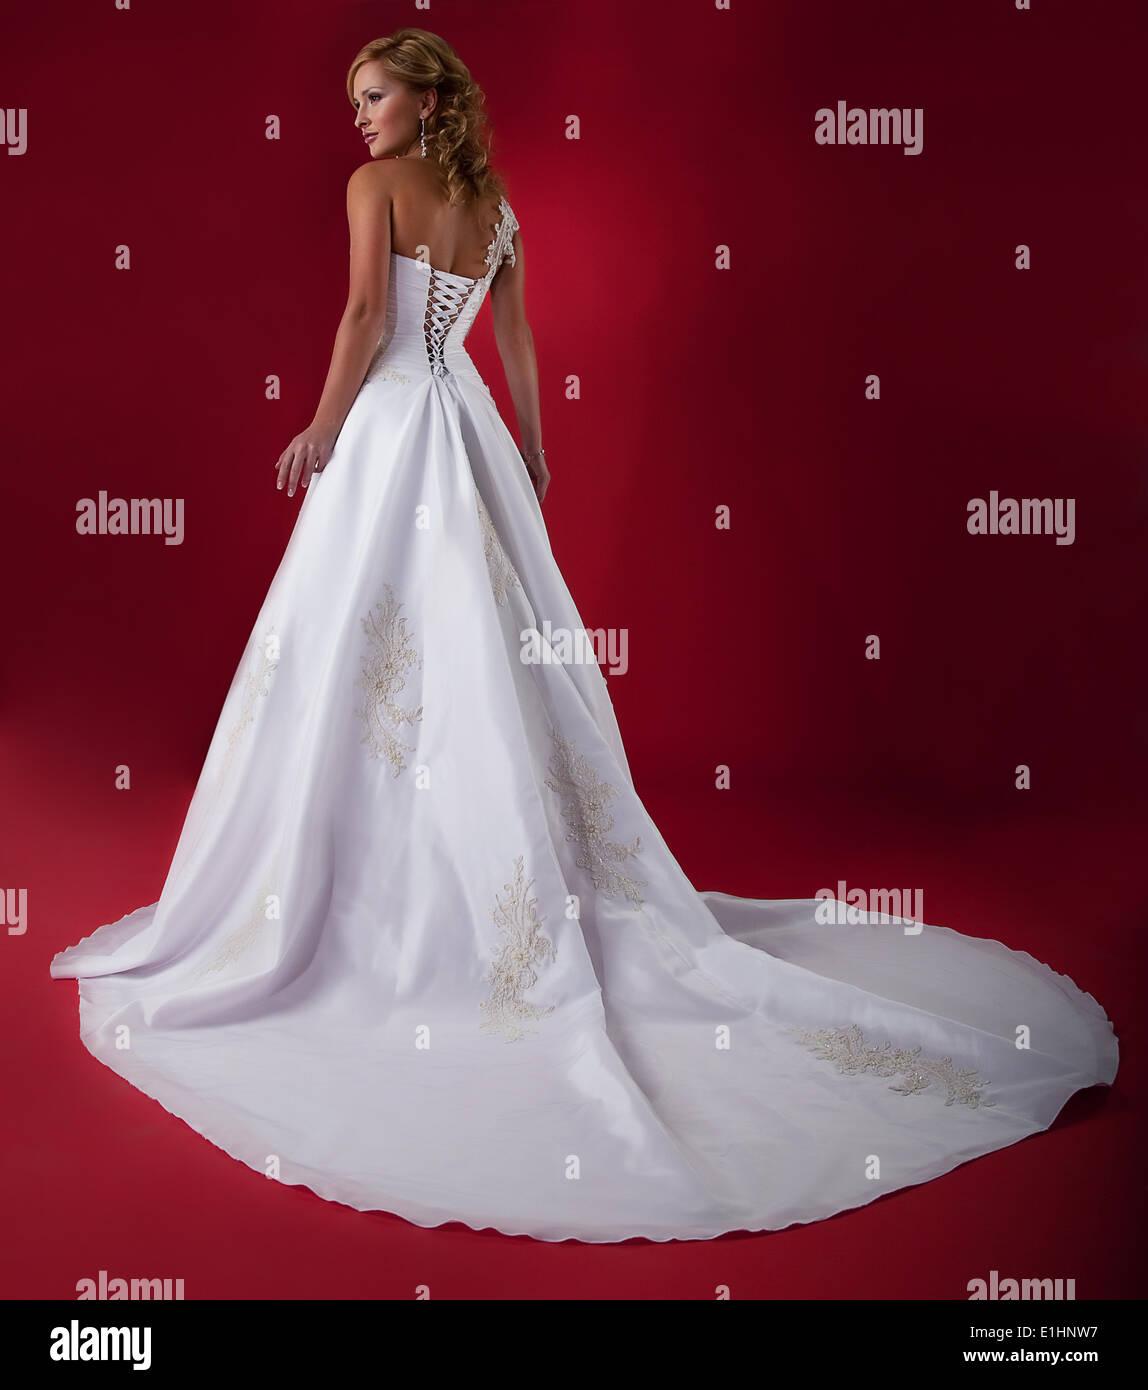 Moda joven rubia novia de largo vestido blanco sobre fondo rojo. Foto de Estudio Imagen De Stock